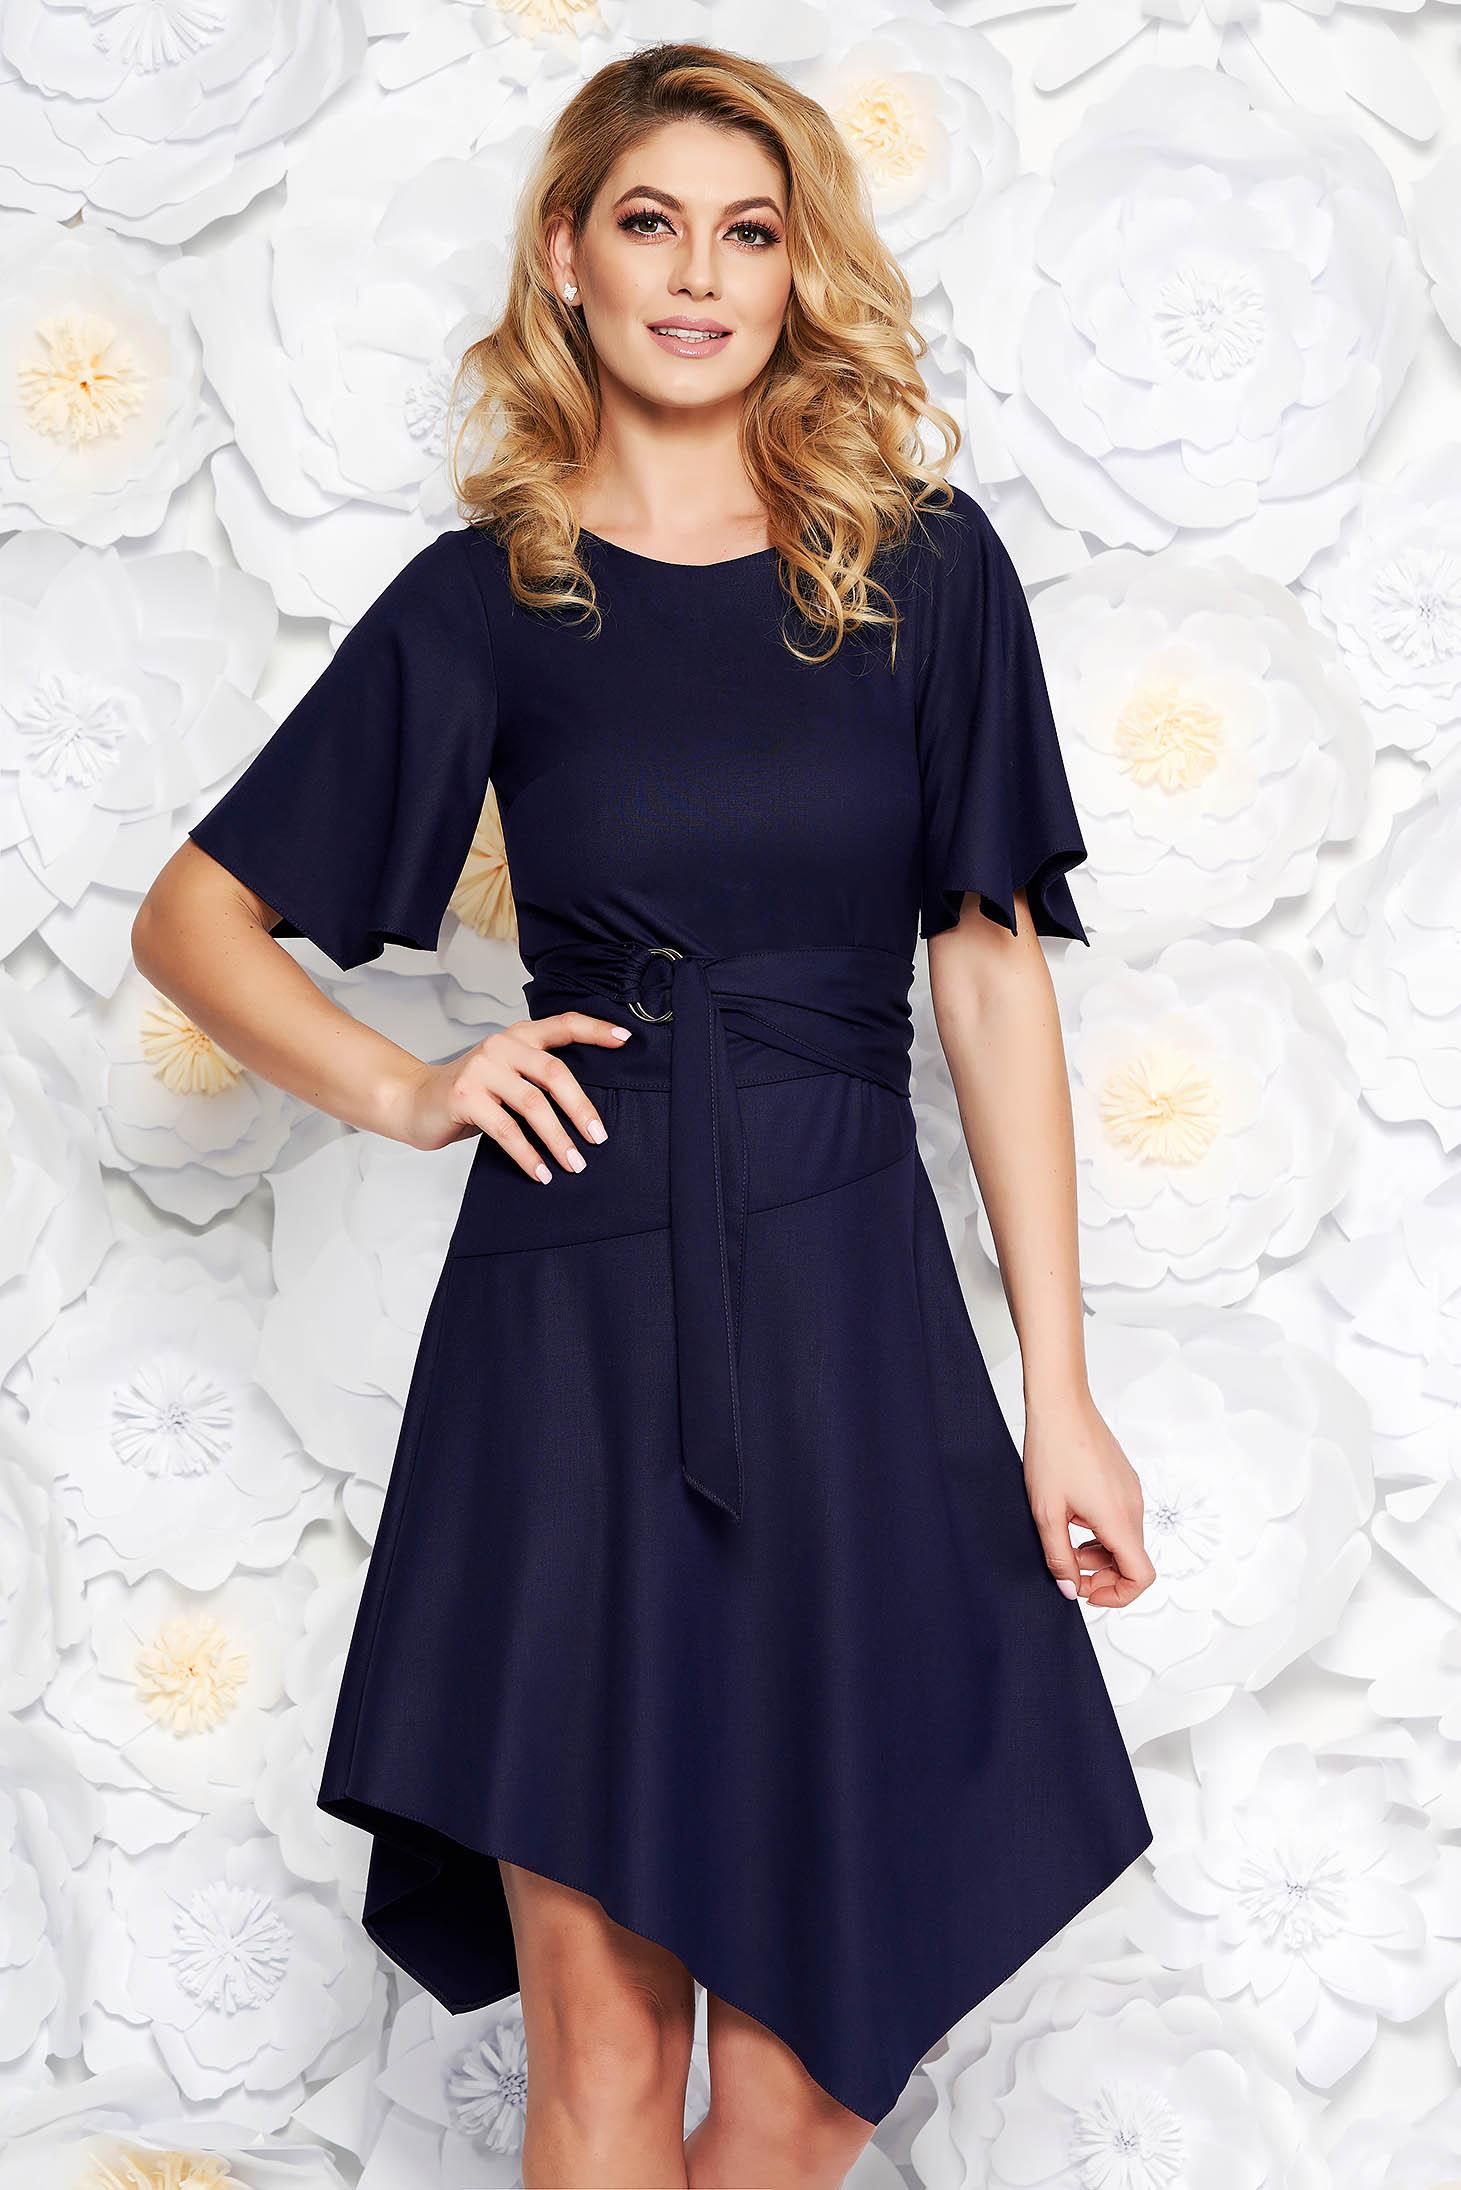 Darkblue daily asymmetrical dress soft fabric accessorized with tied waistband